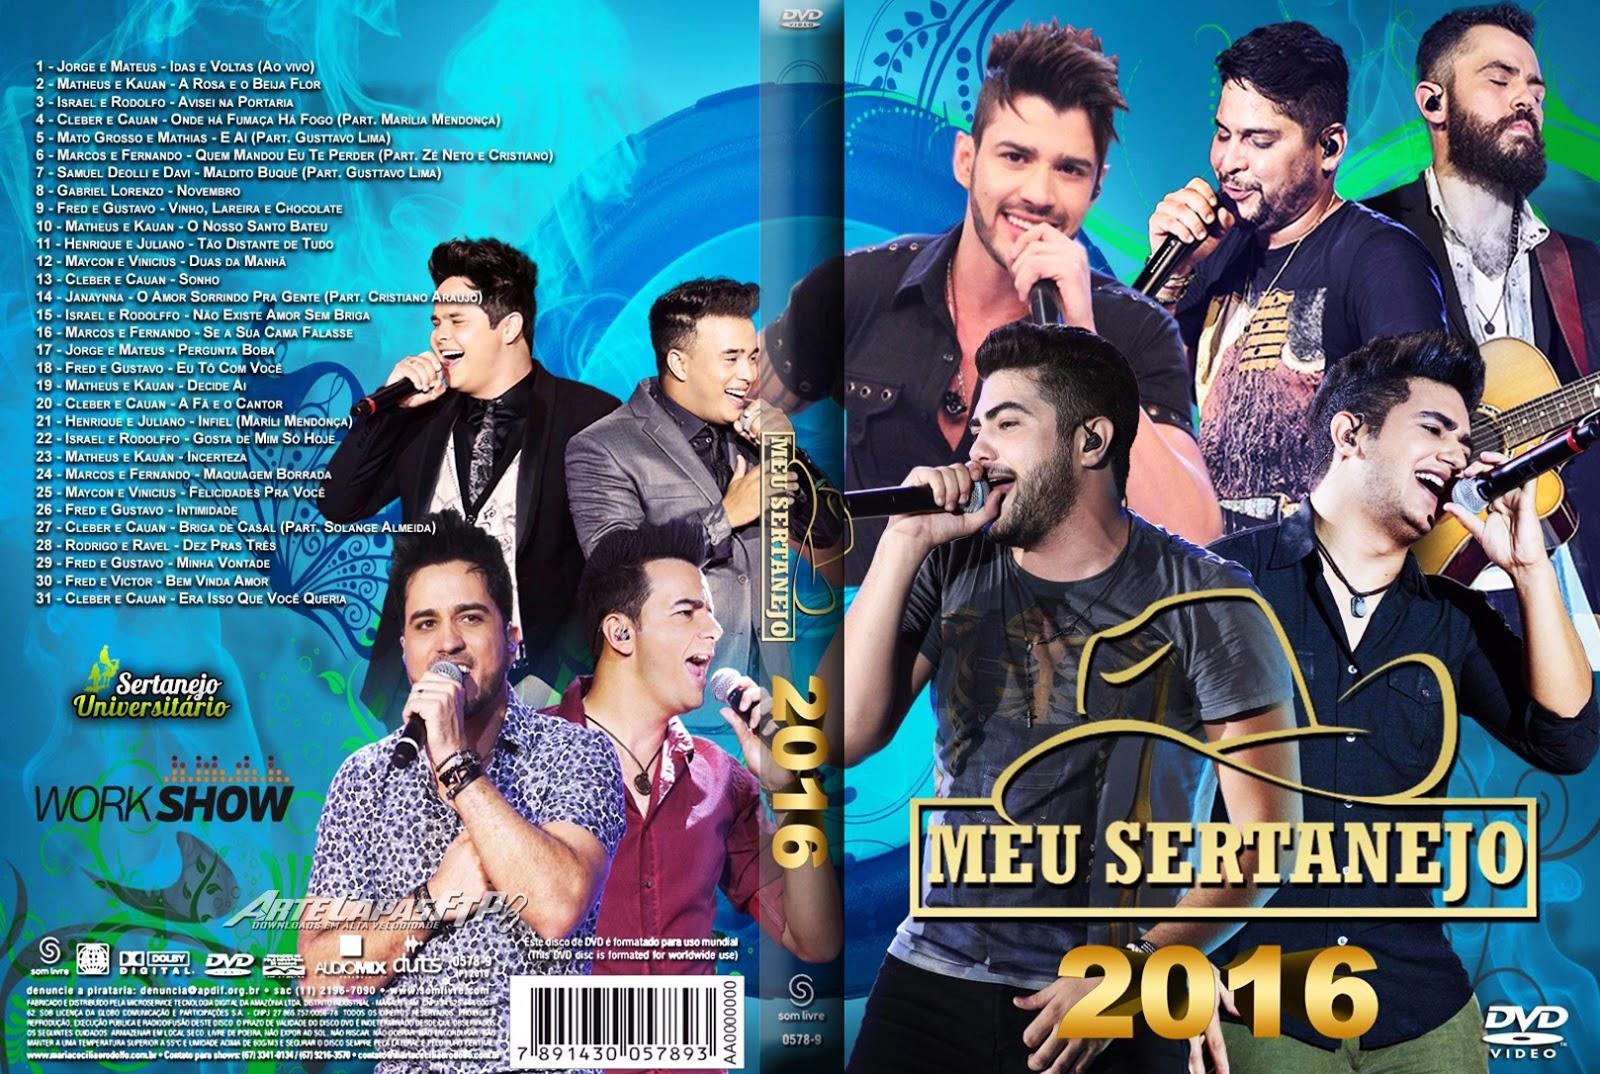 Meu Sertanejo 2016 Vol.1 DVDRip + DVD-R Meu 2BSertanejo 2B2016 2BVol